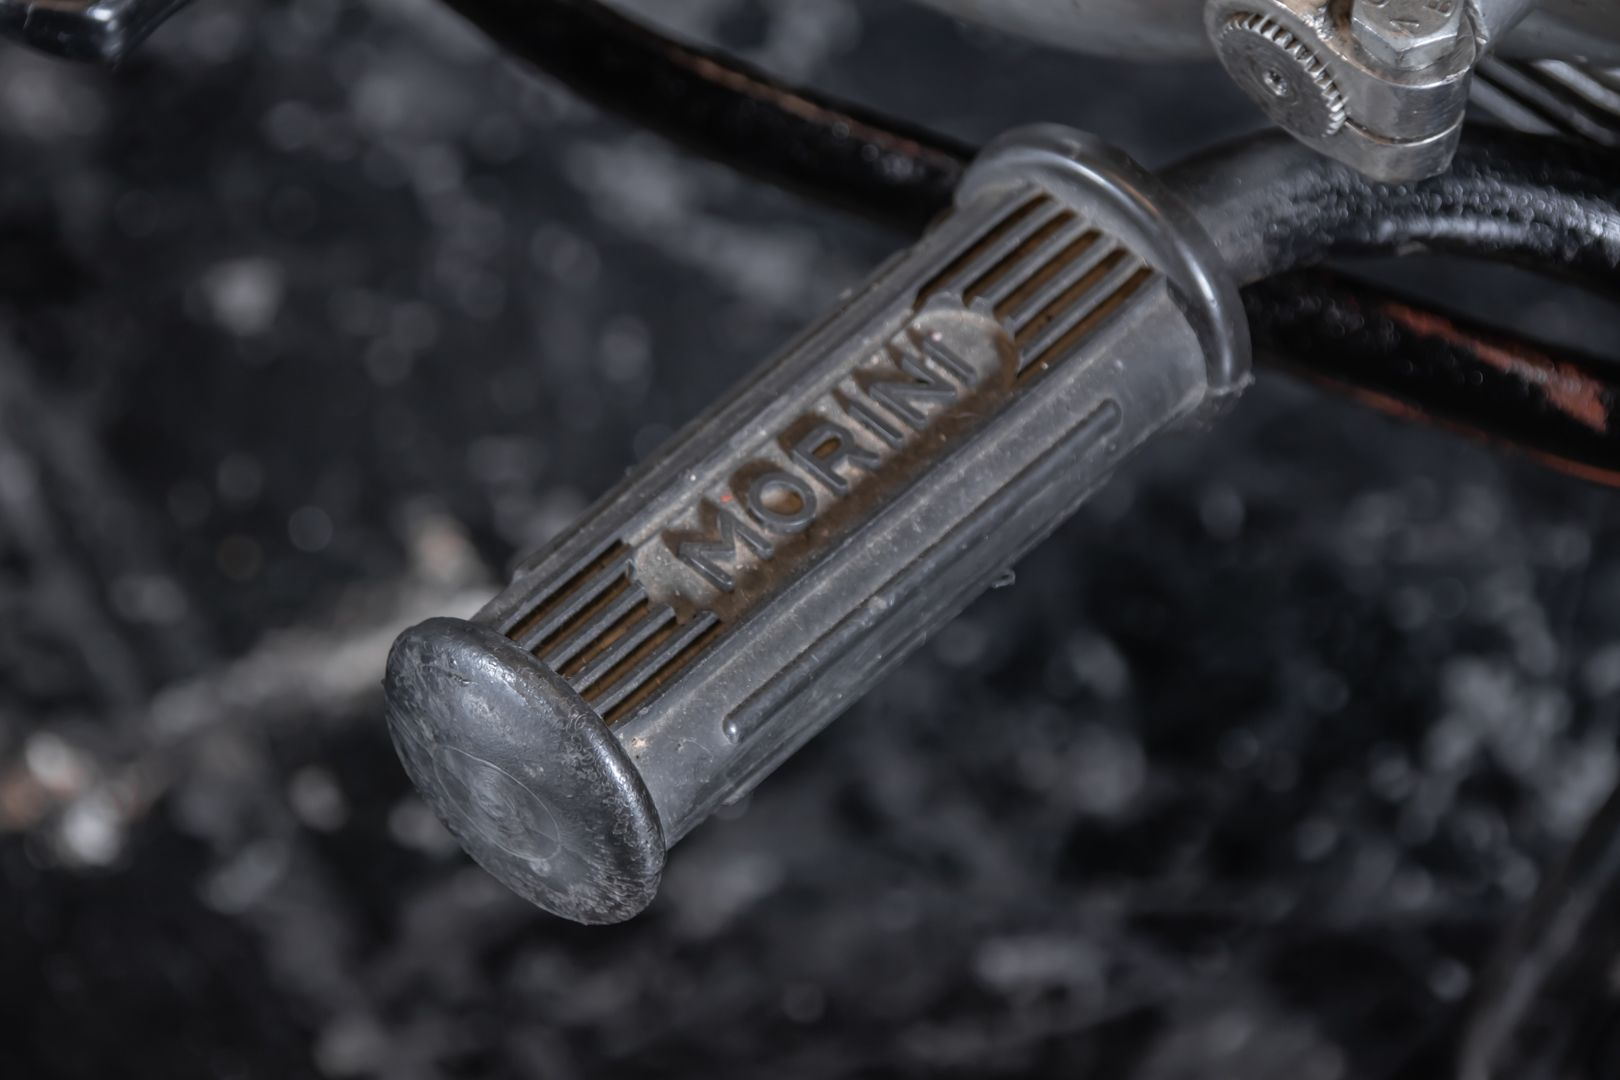 1960 Moto Morini Tresette Sprint 175 76485